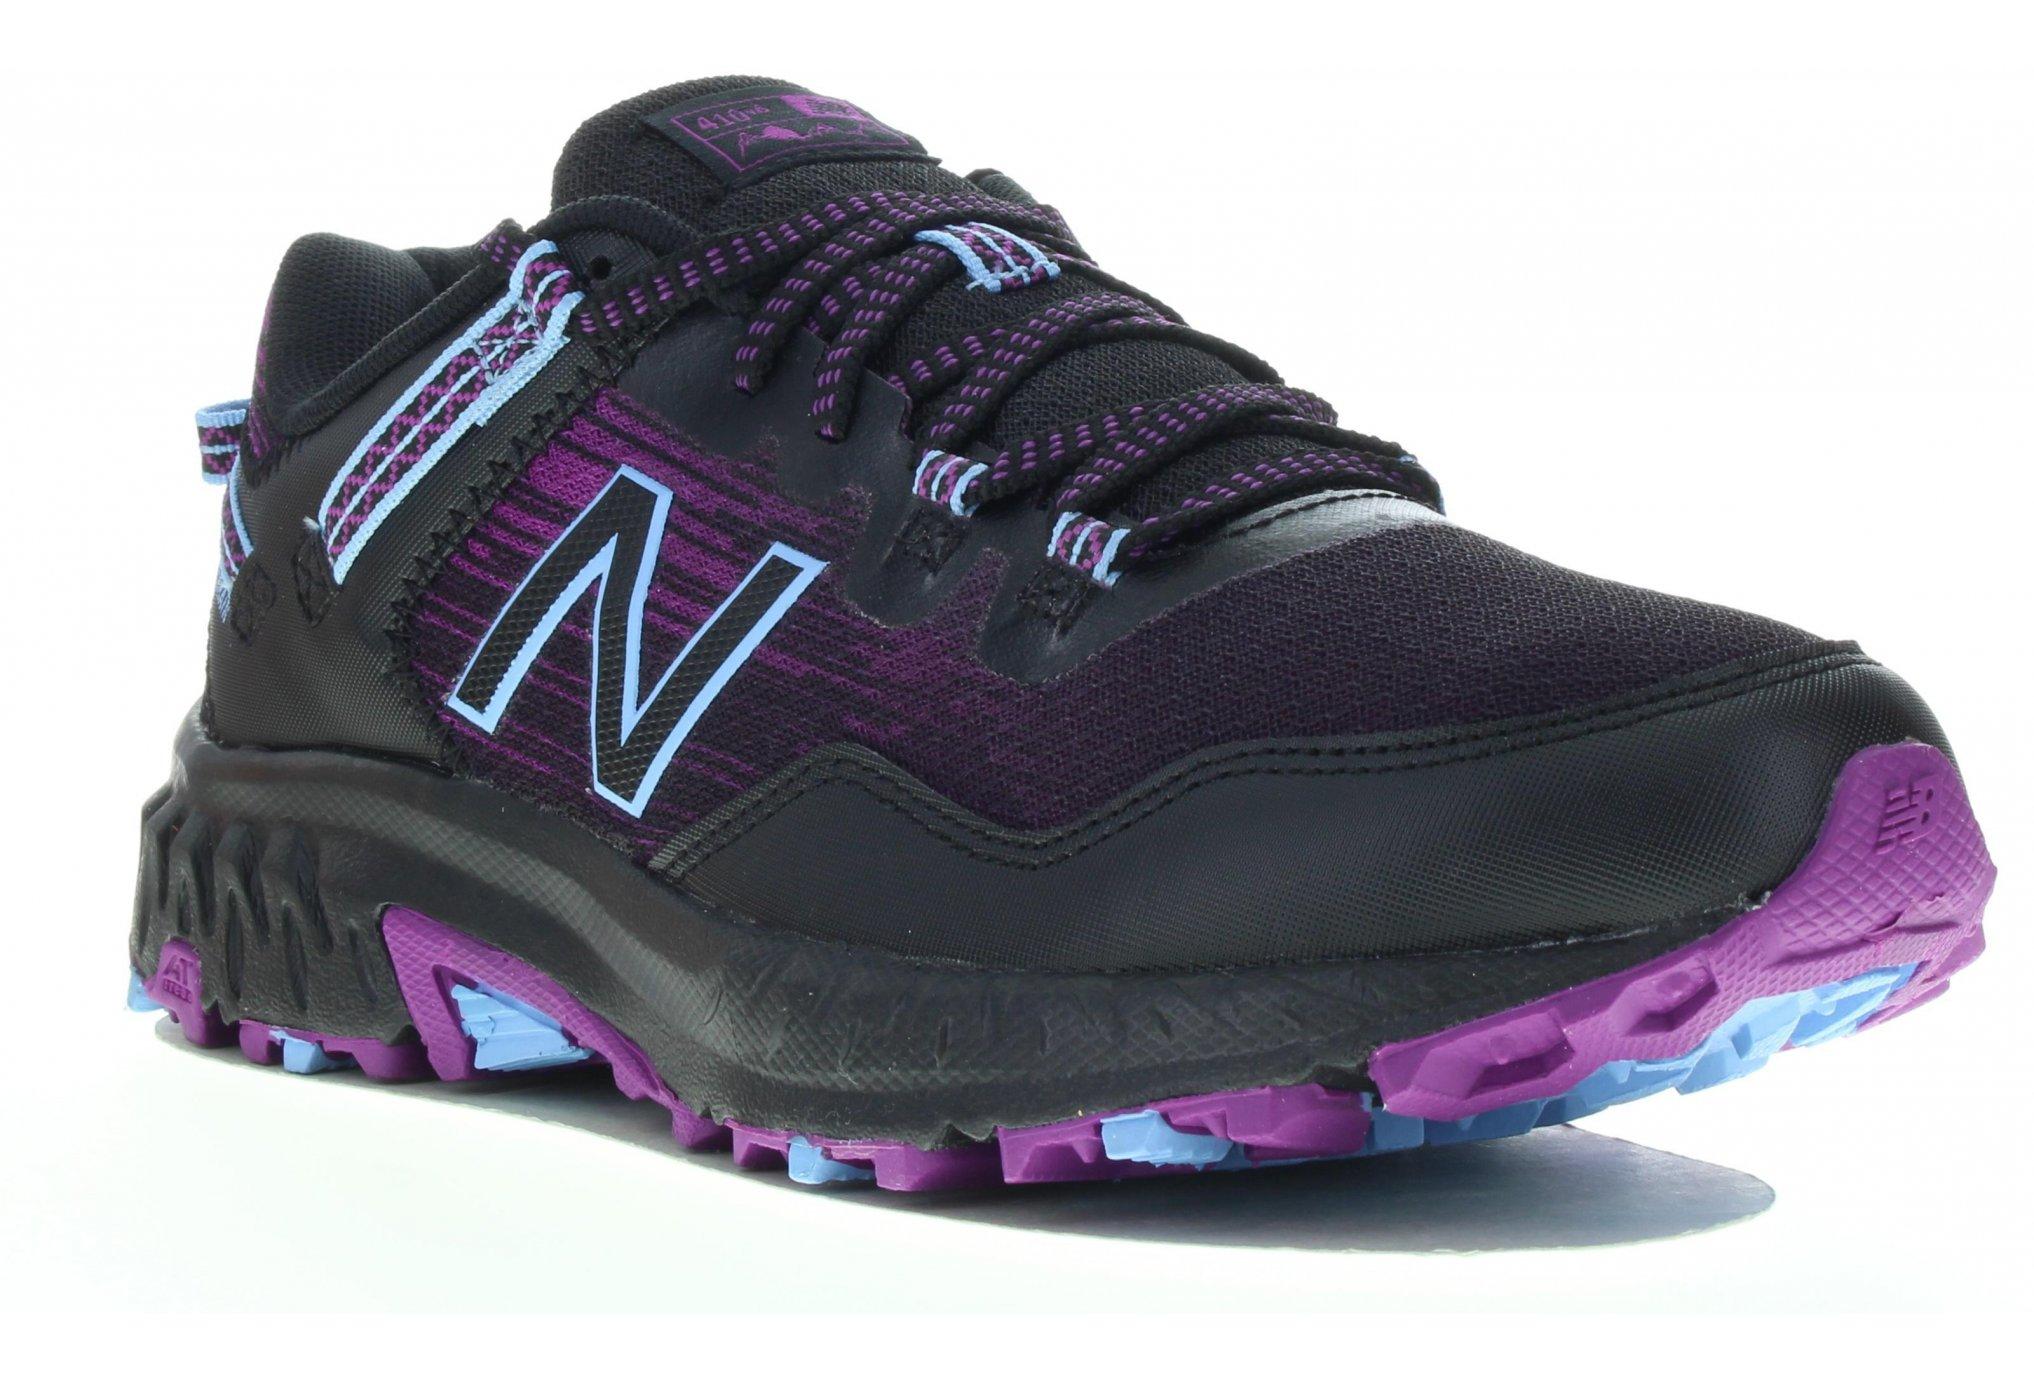 New Balance W 410 V6 - B Chaussures running femme